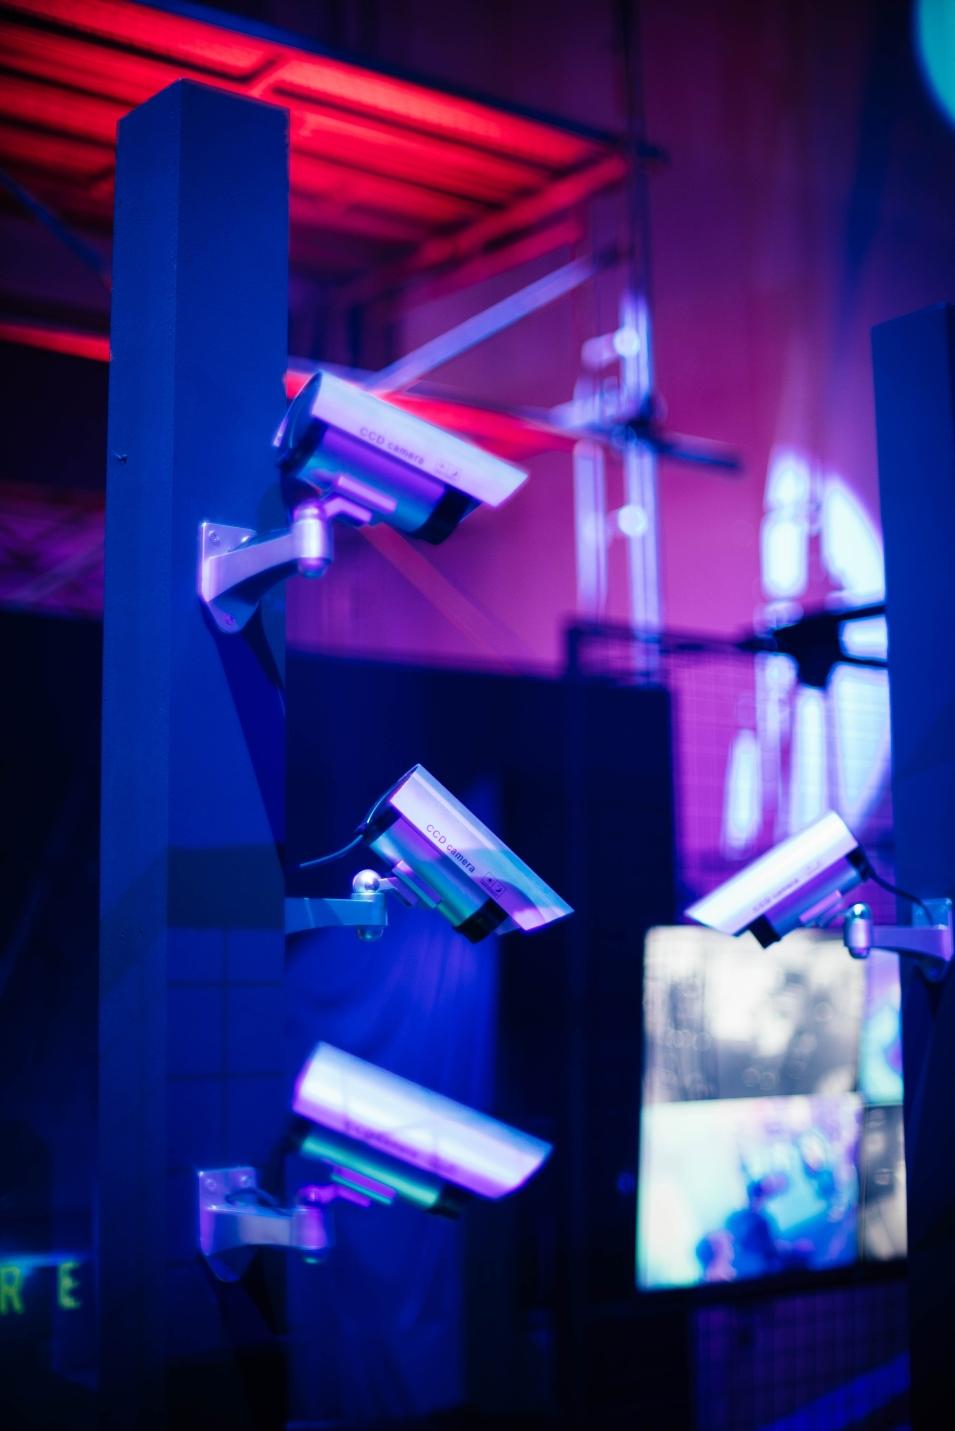 security-cameras-in-night-club